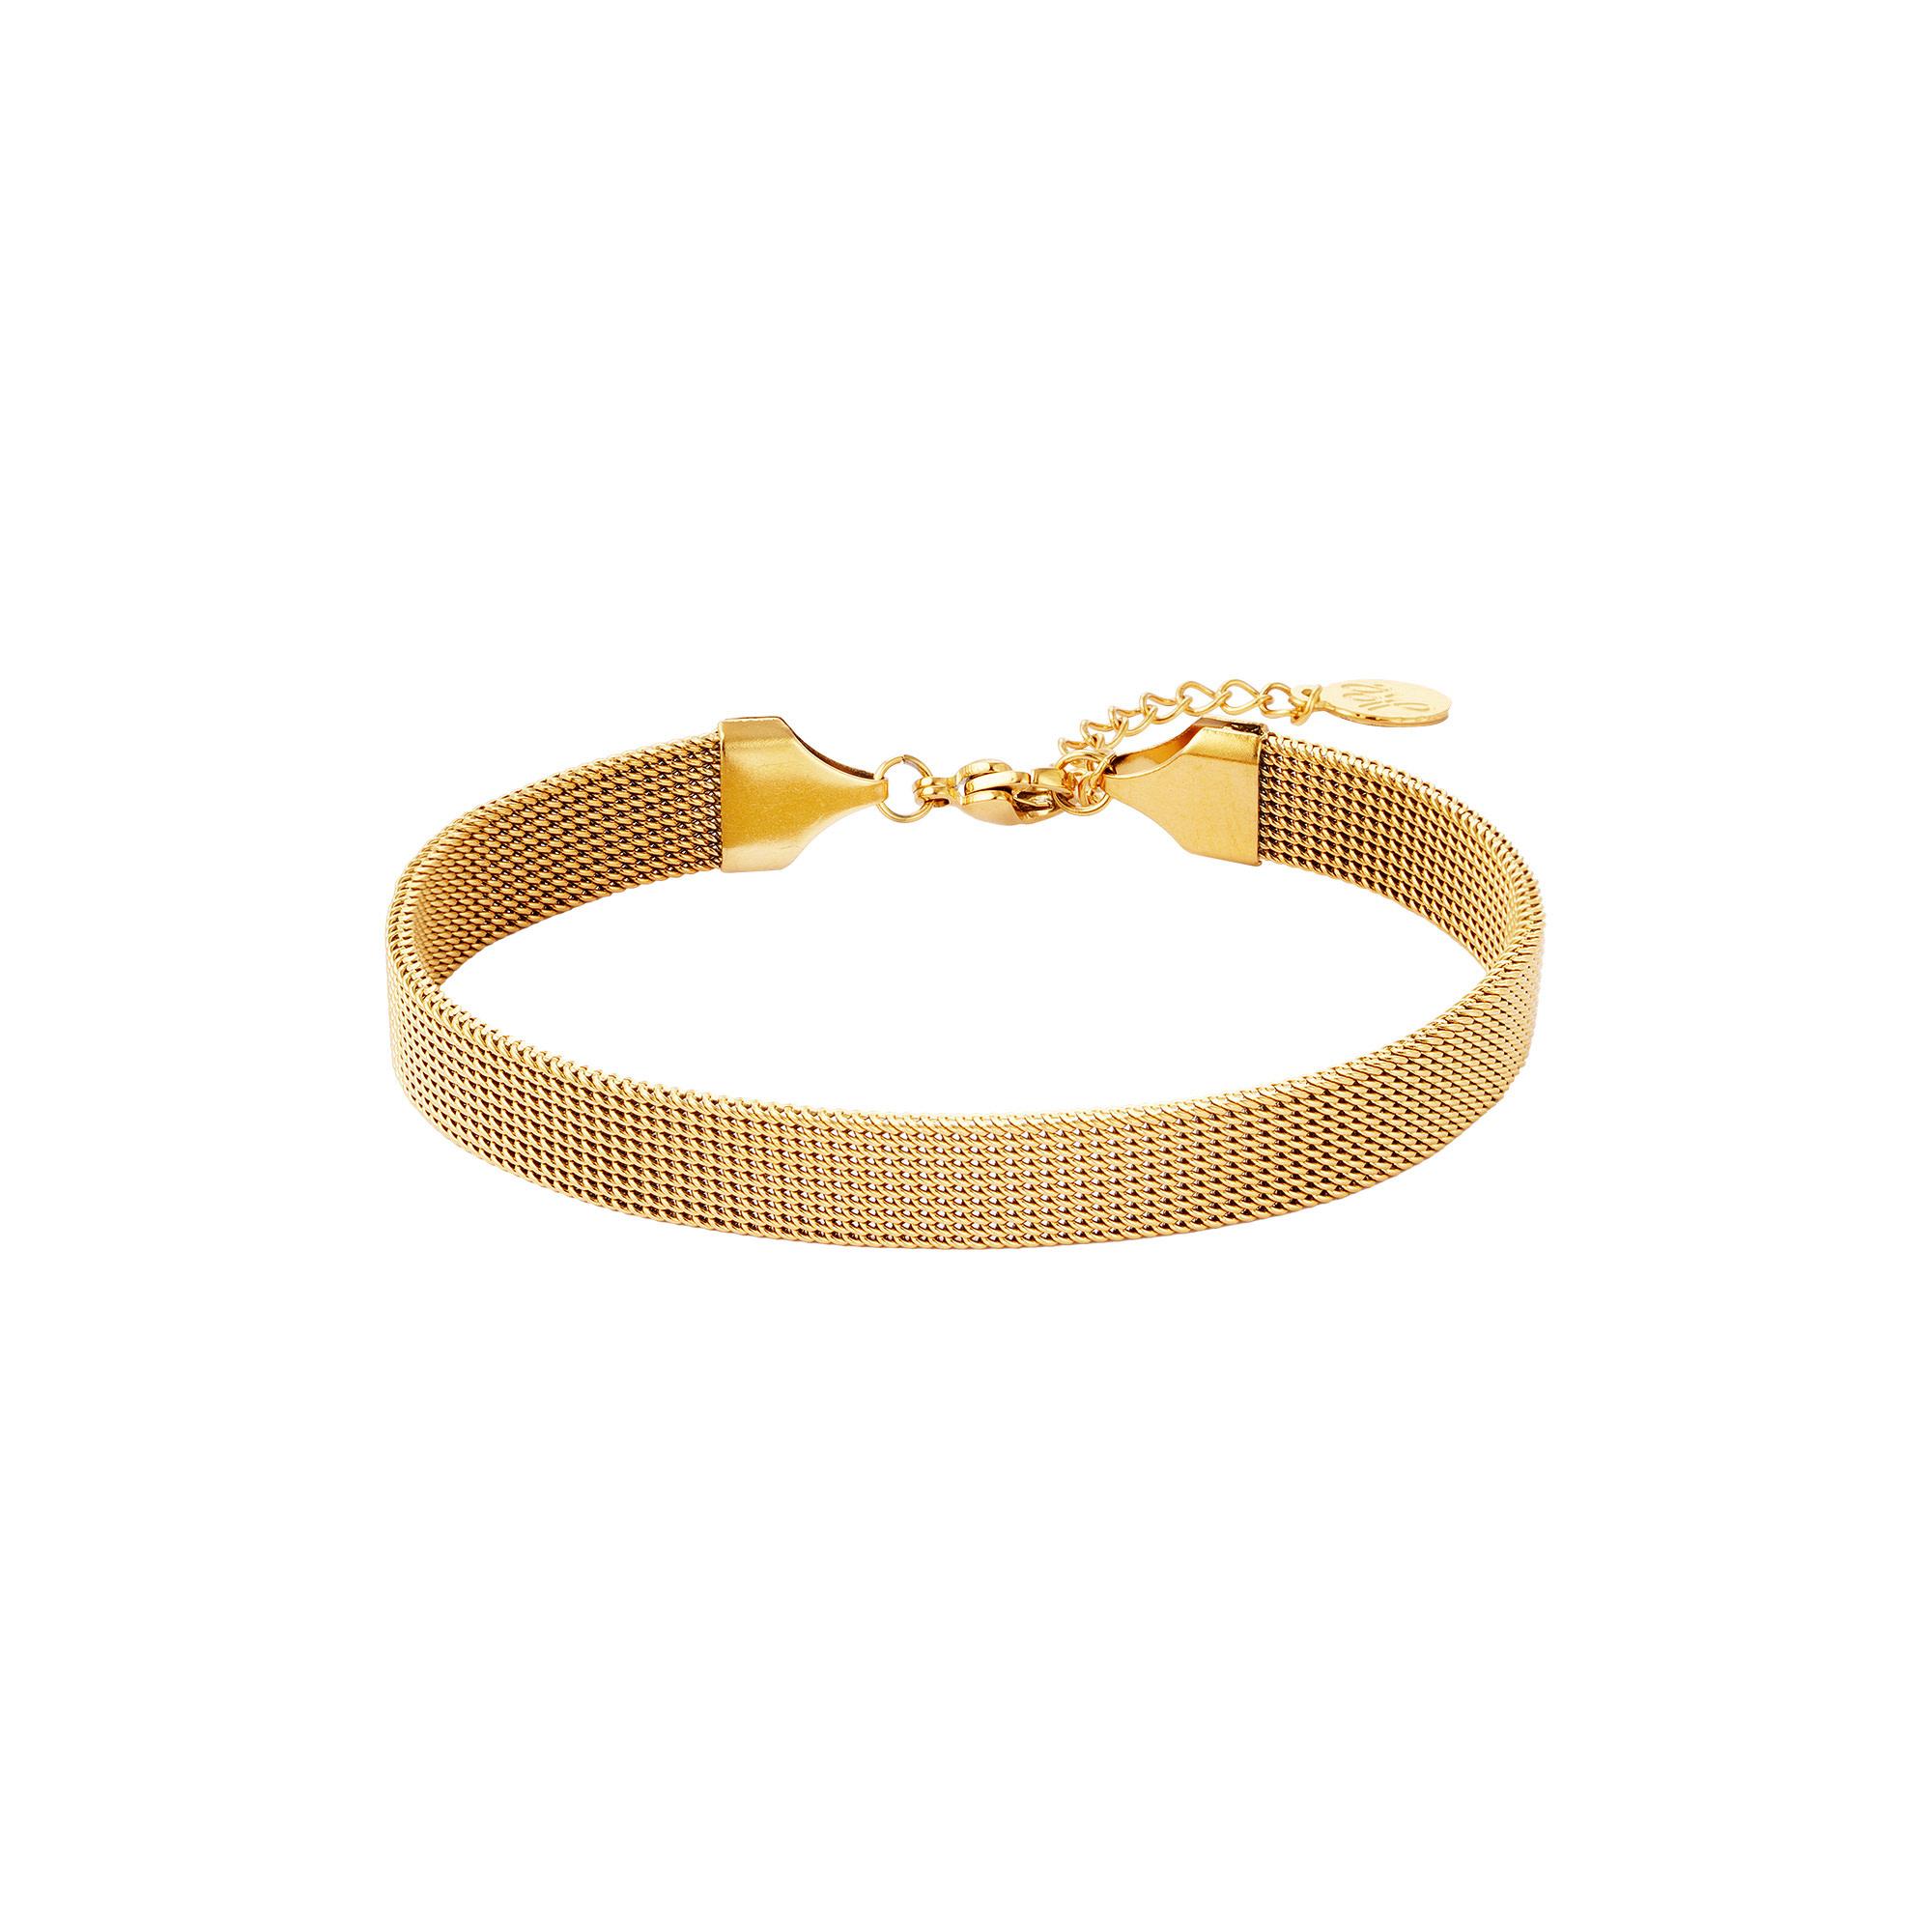 With love Bracelet gold